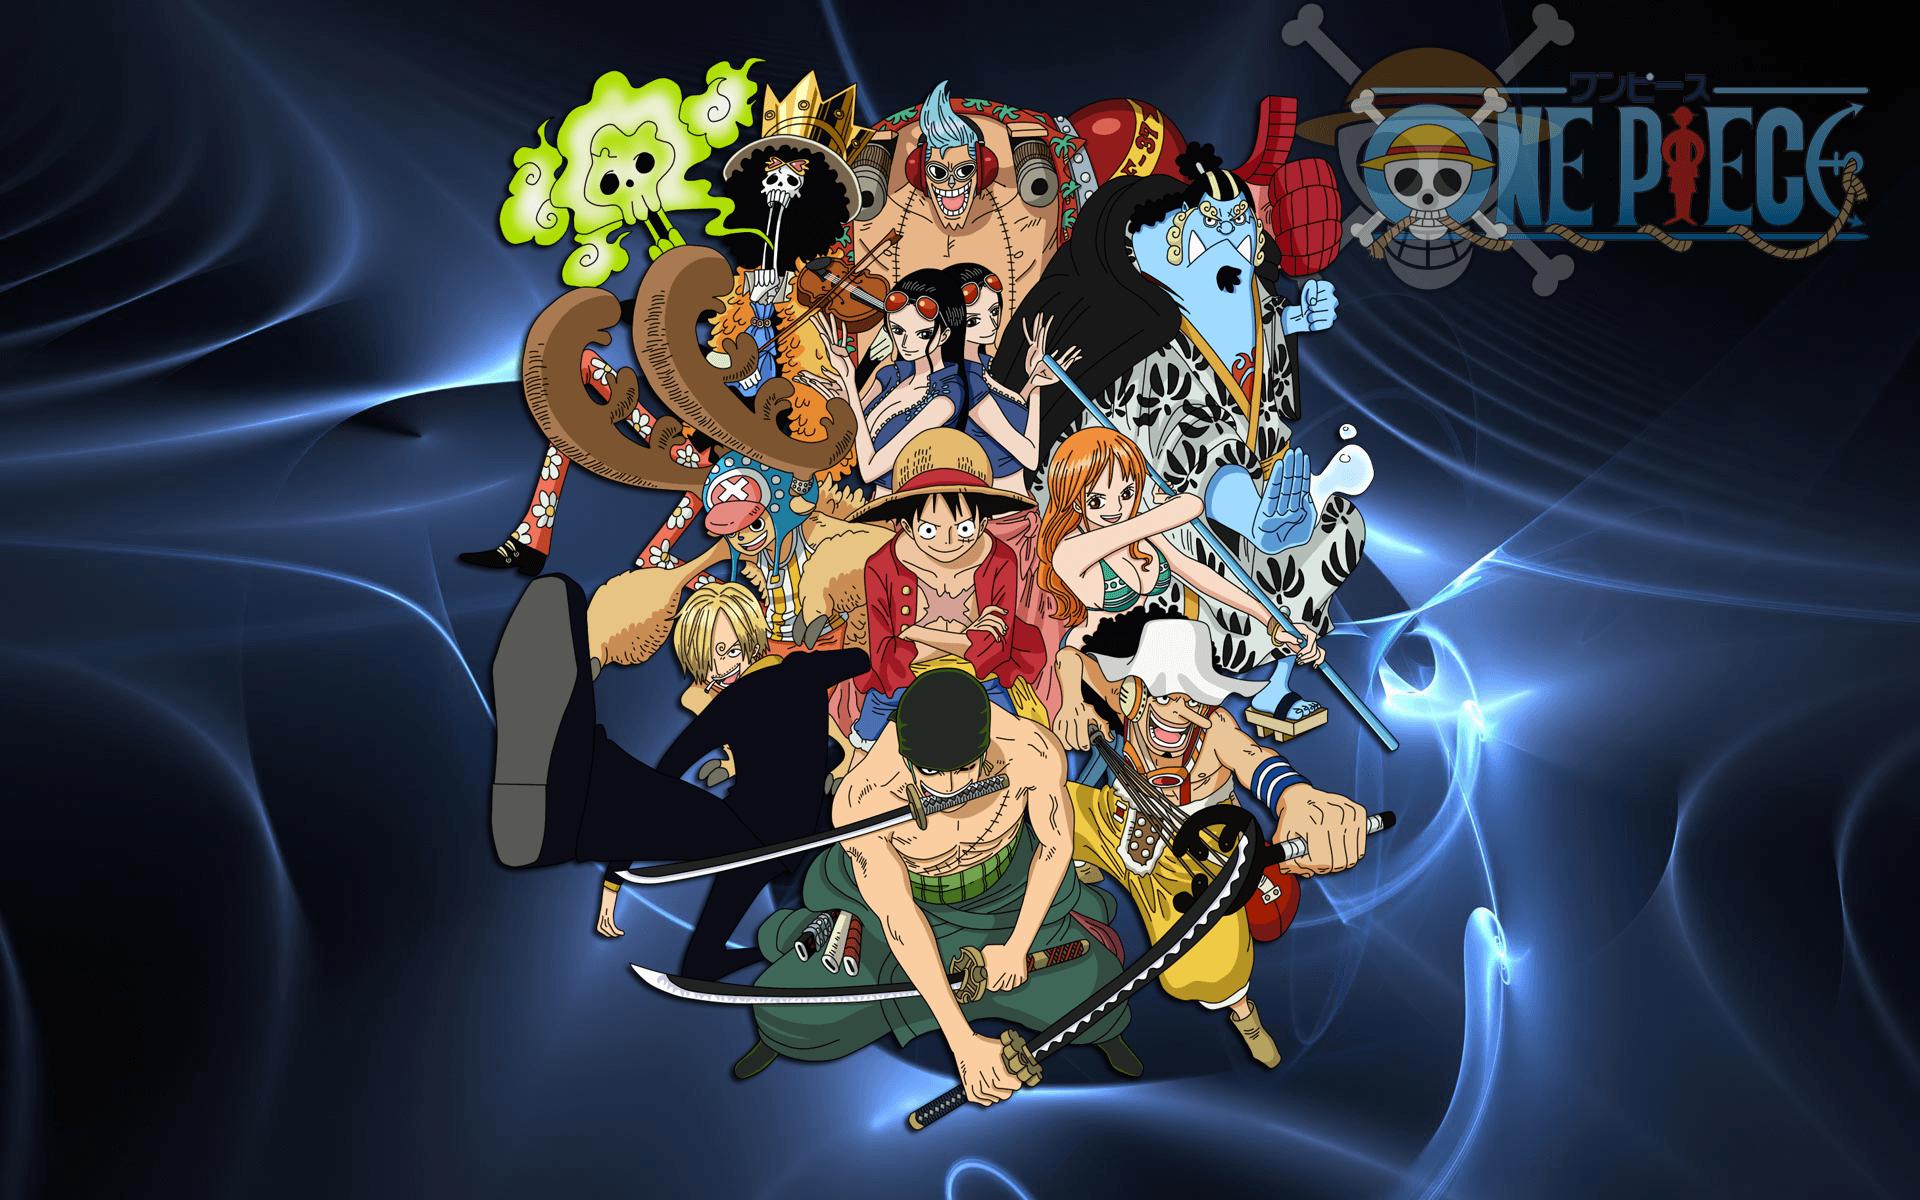 Unduh 850 Koleksi Wallpaper 3d One Piece Hd Terbaru Wallpaper Anime Wallpaper Seni Cover Art